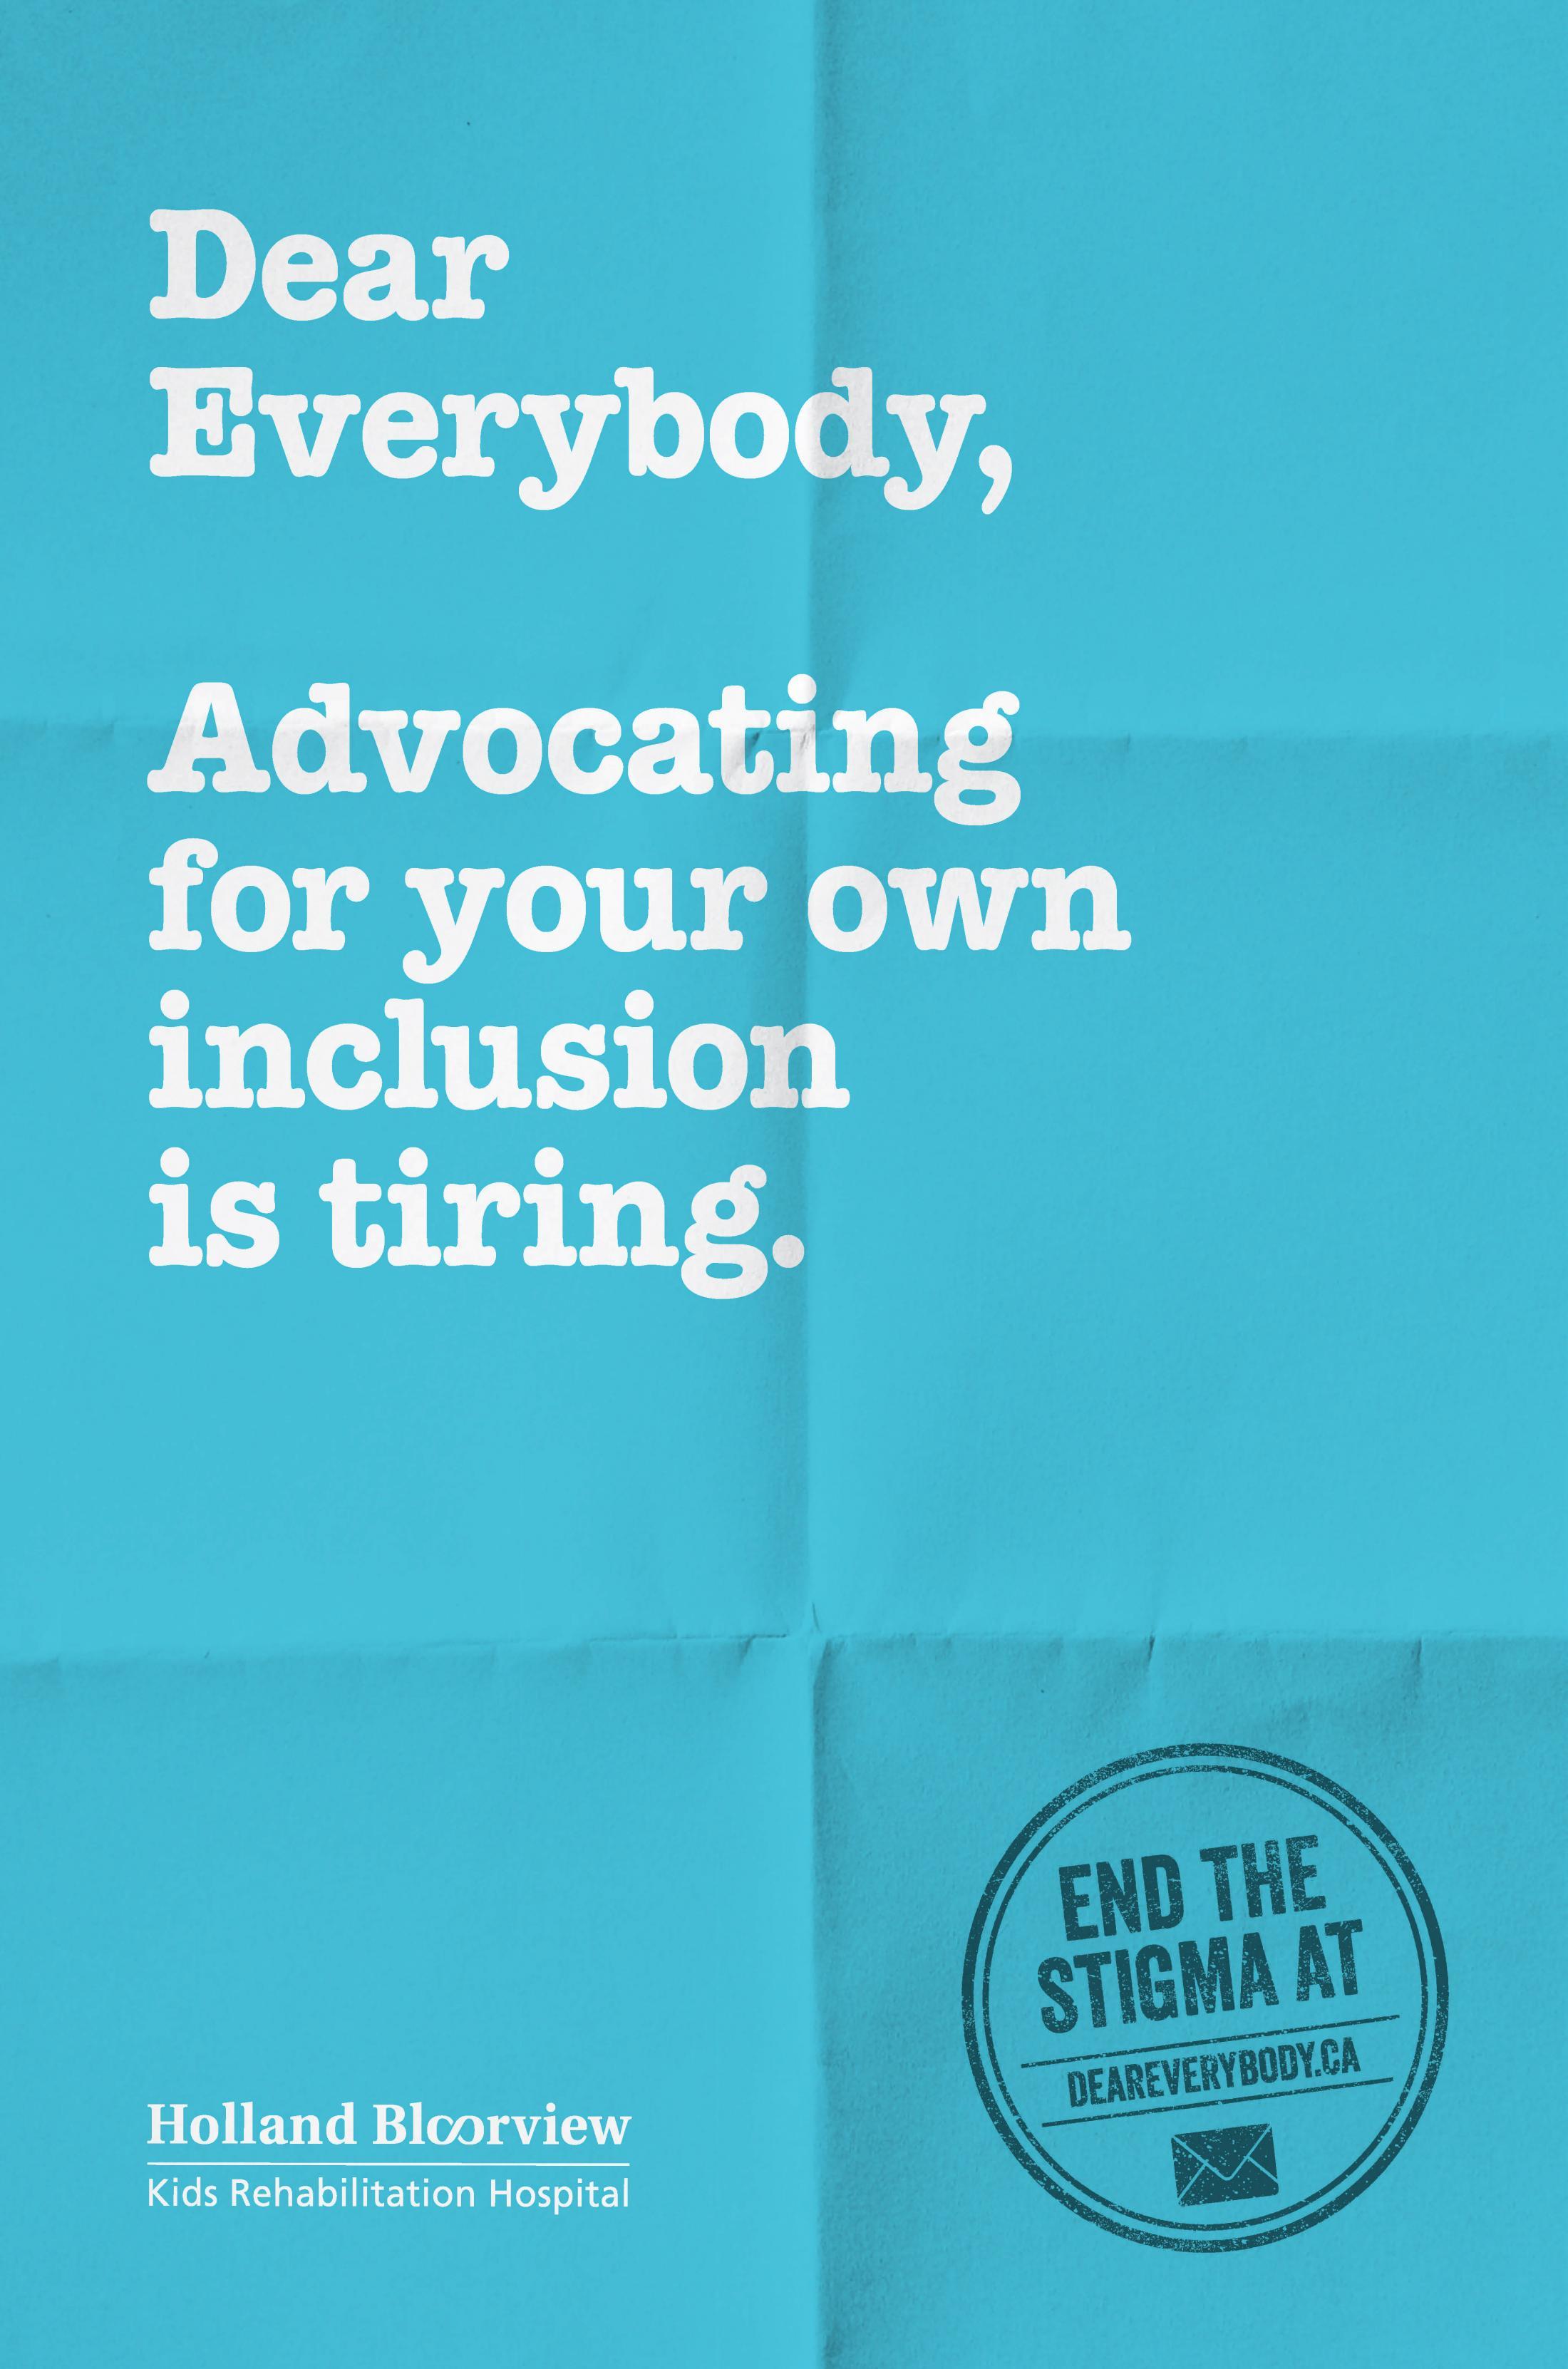 Holland Bloorview Kids Rehabilitation Outdoor Ad - Dear Everybody, 8